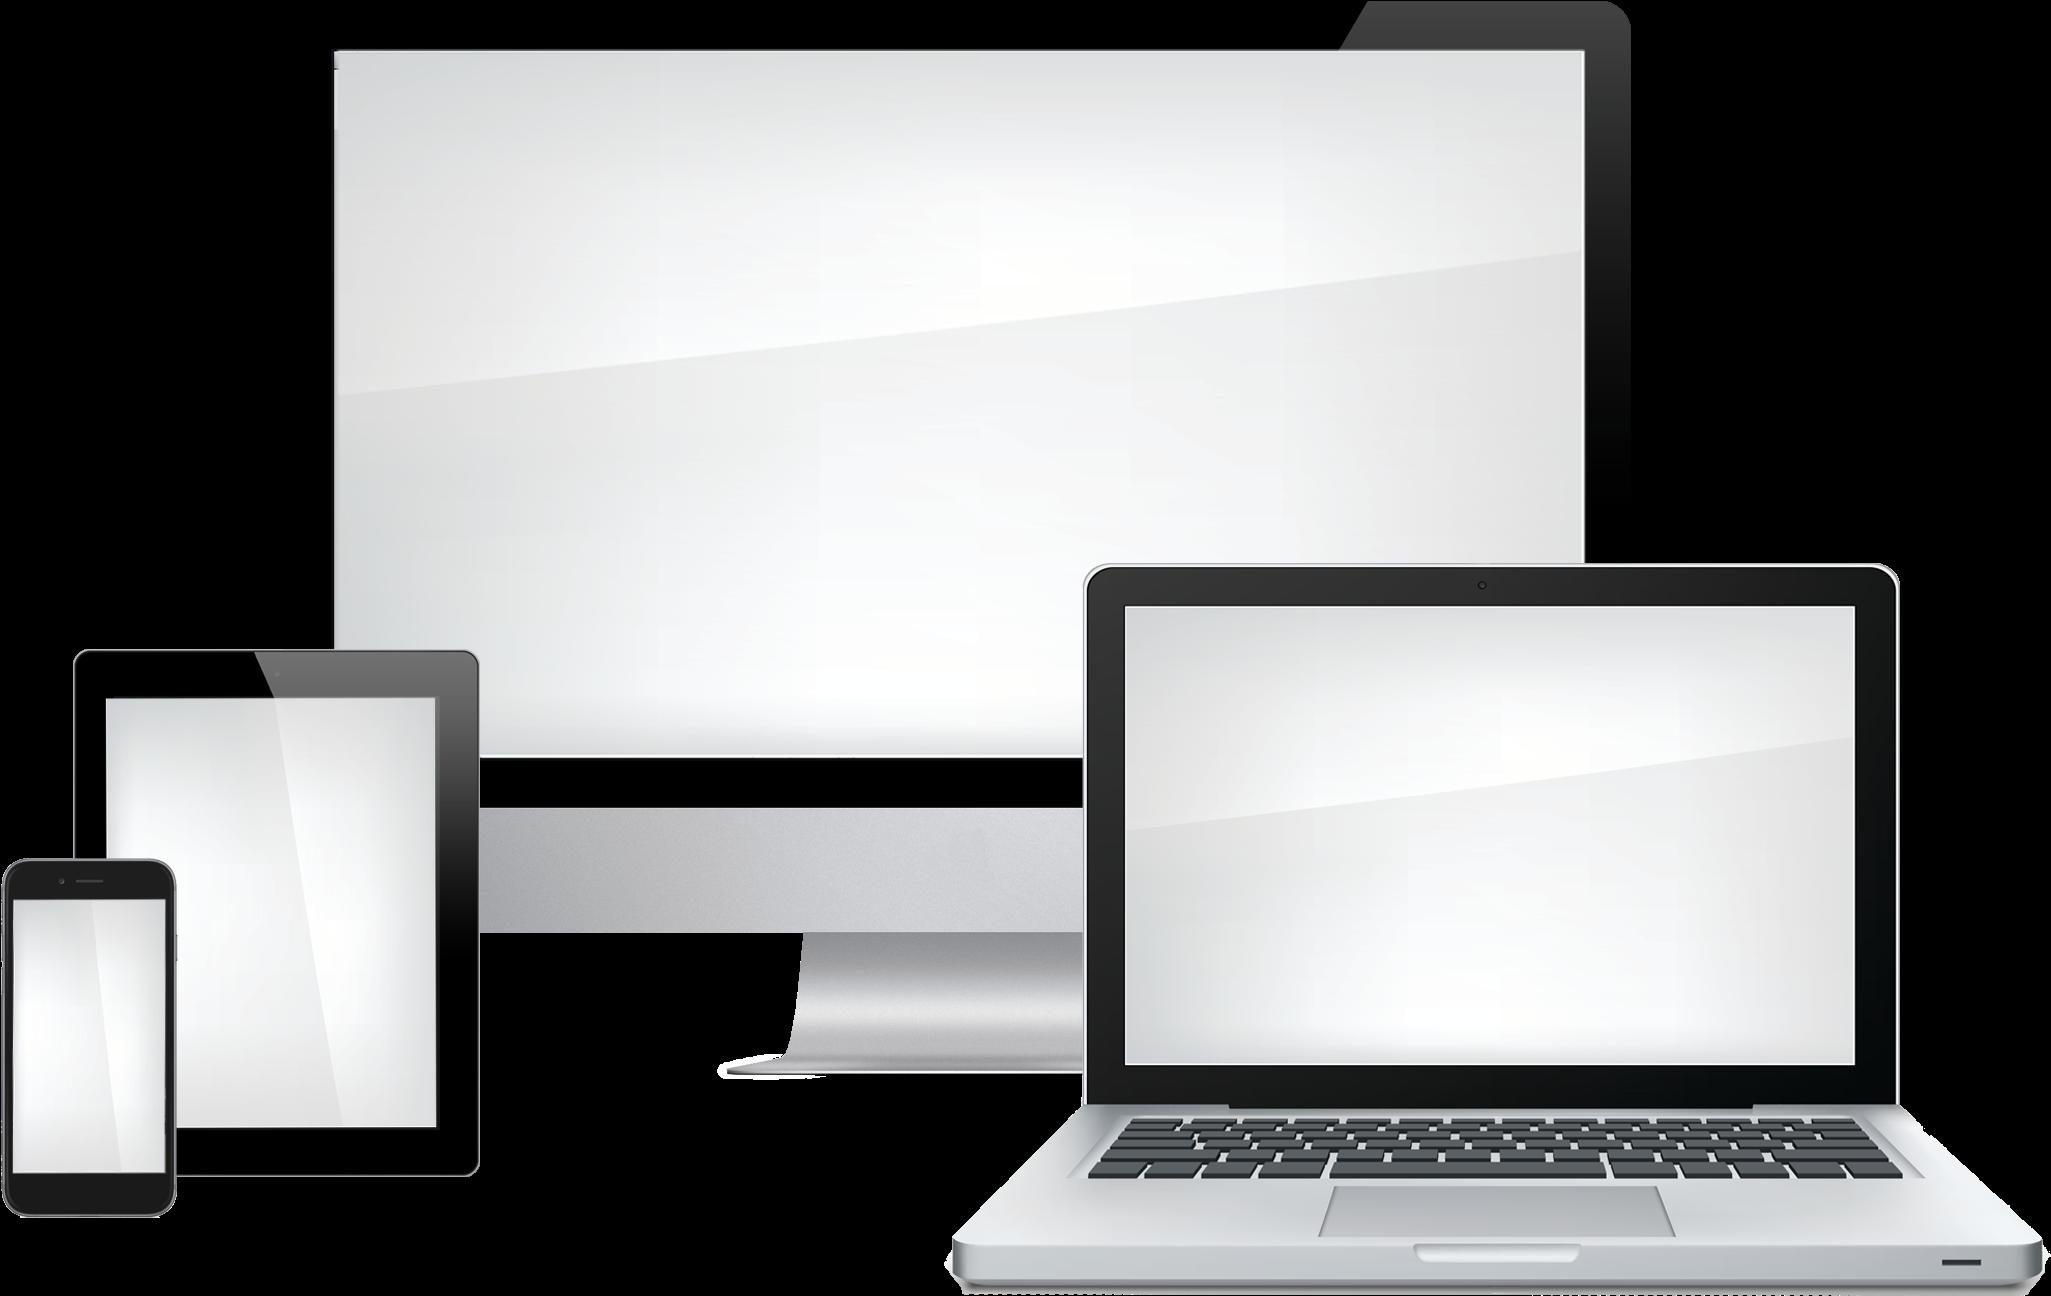 PC-Laptop-Tablet-Mobile